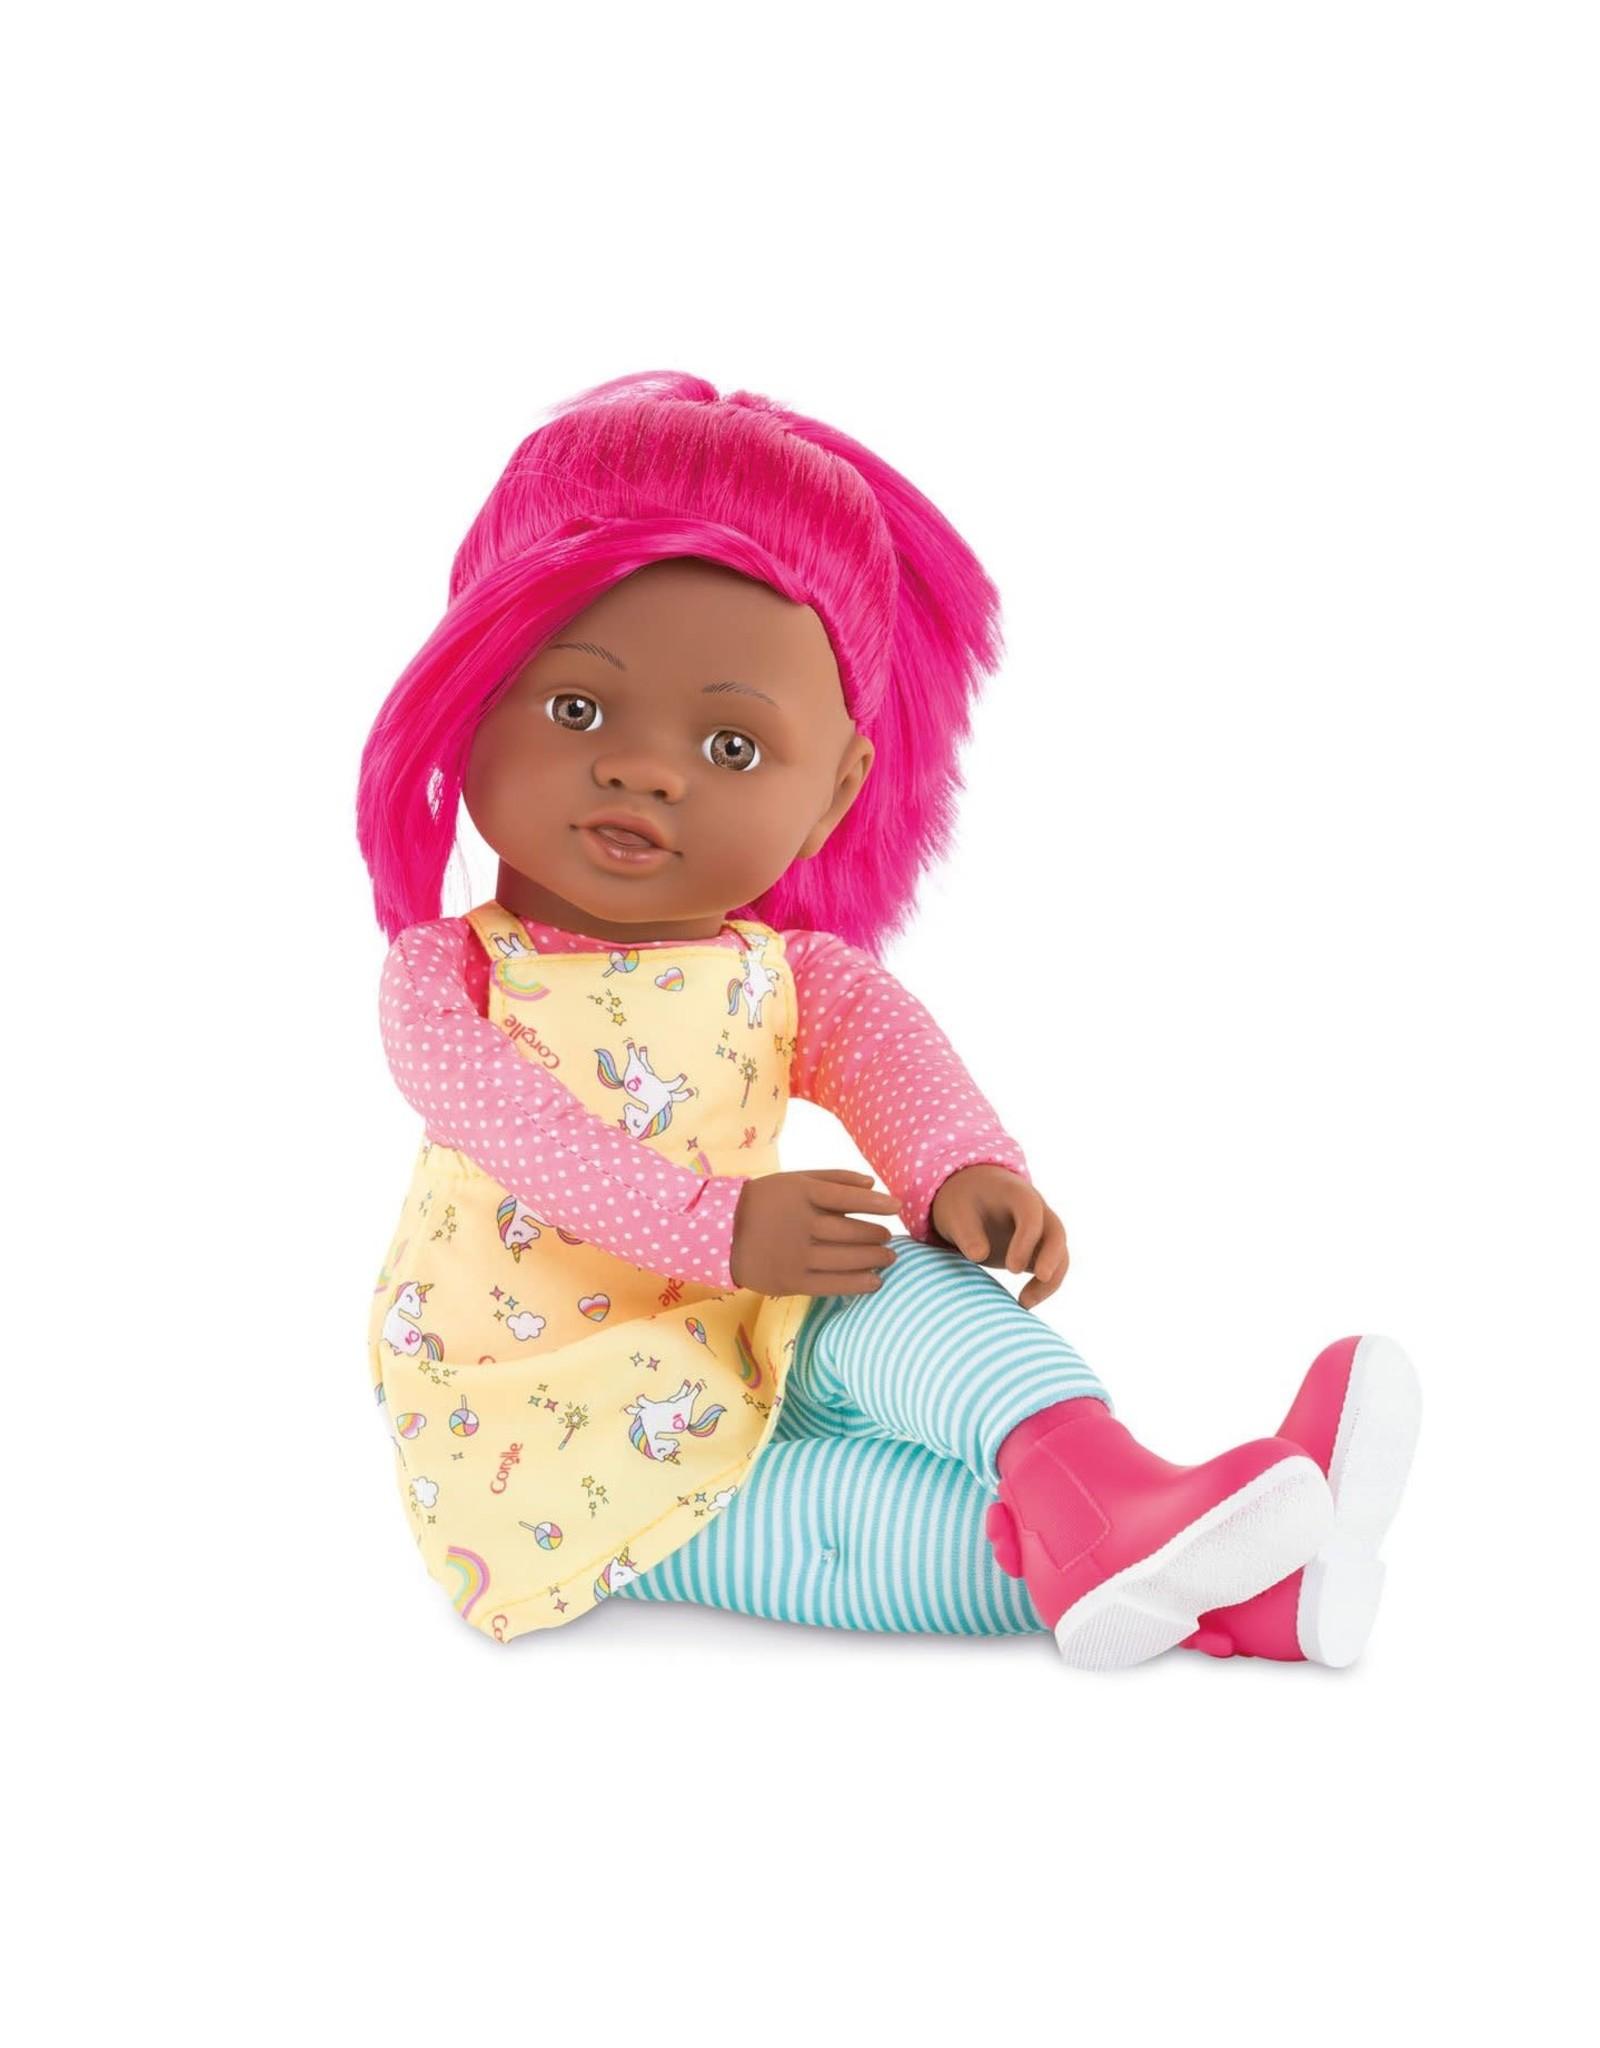 Corolle Corolle Rainbow Doll - Celena